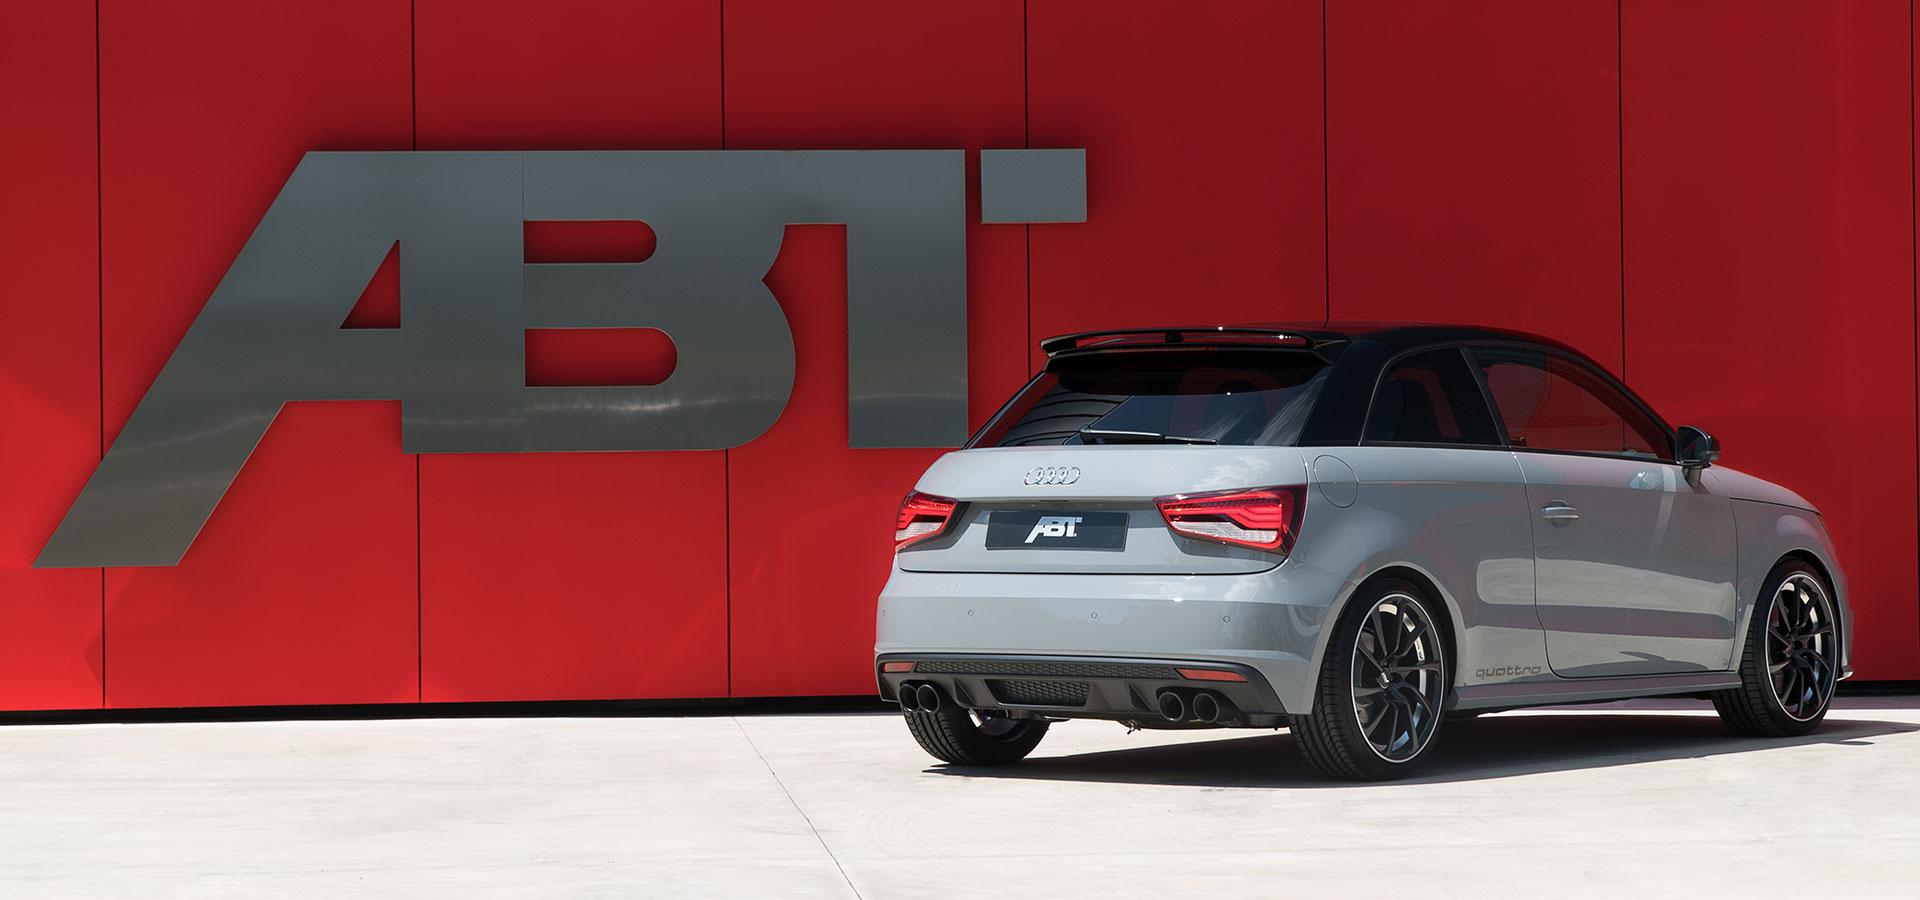 Audi S1 - ABT Sportsline